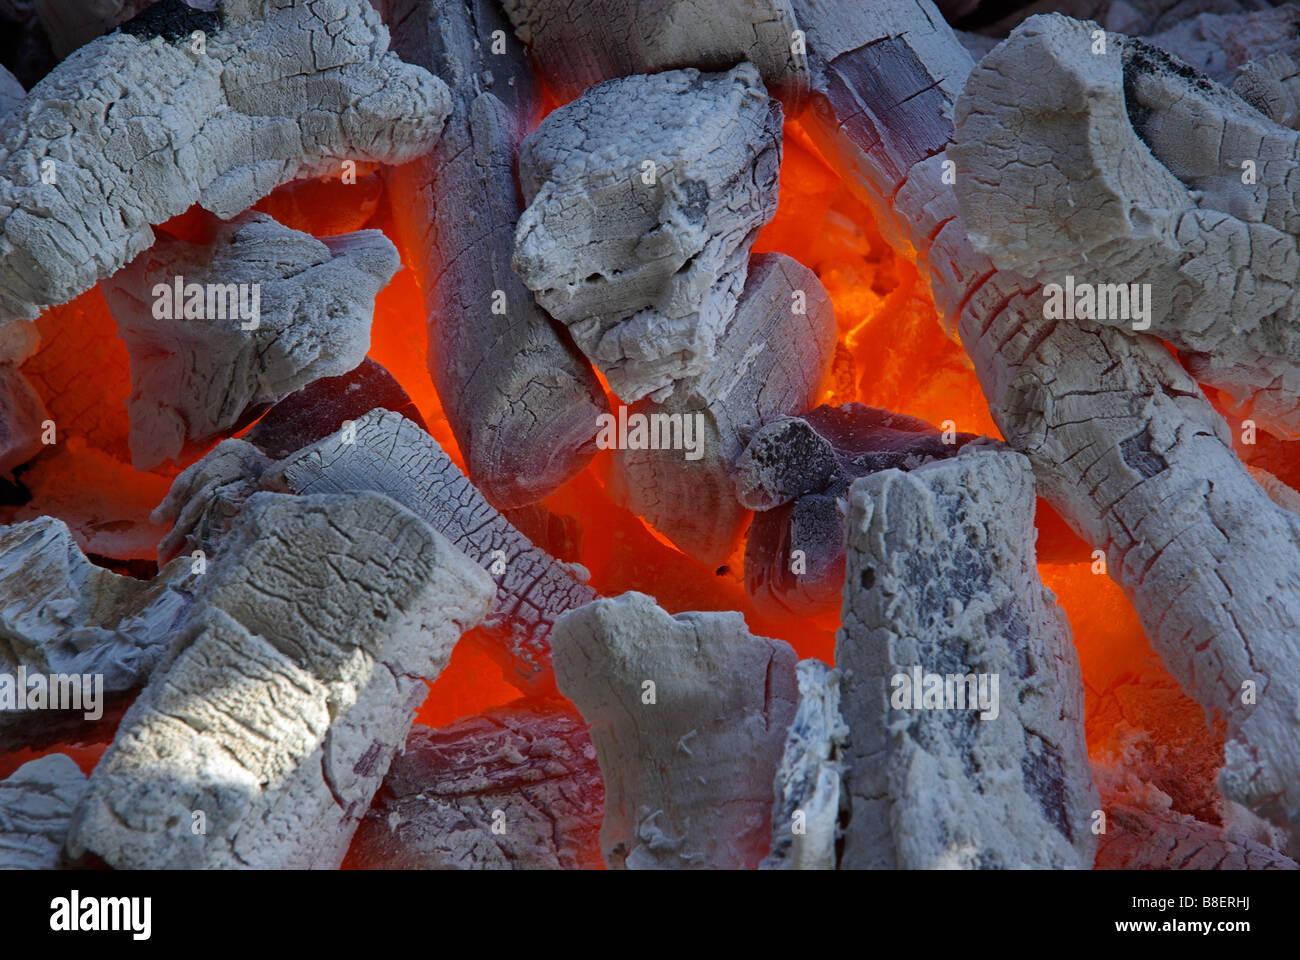 Carbone Holzkohle 16 Immagini Stock